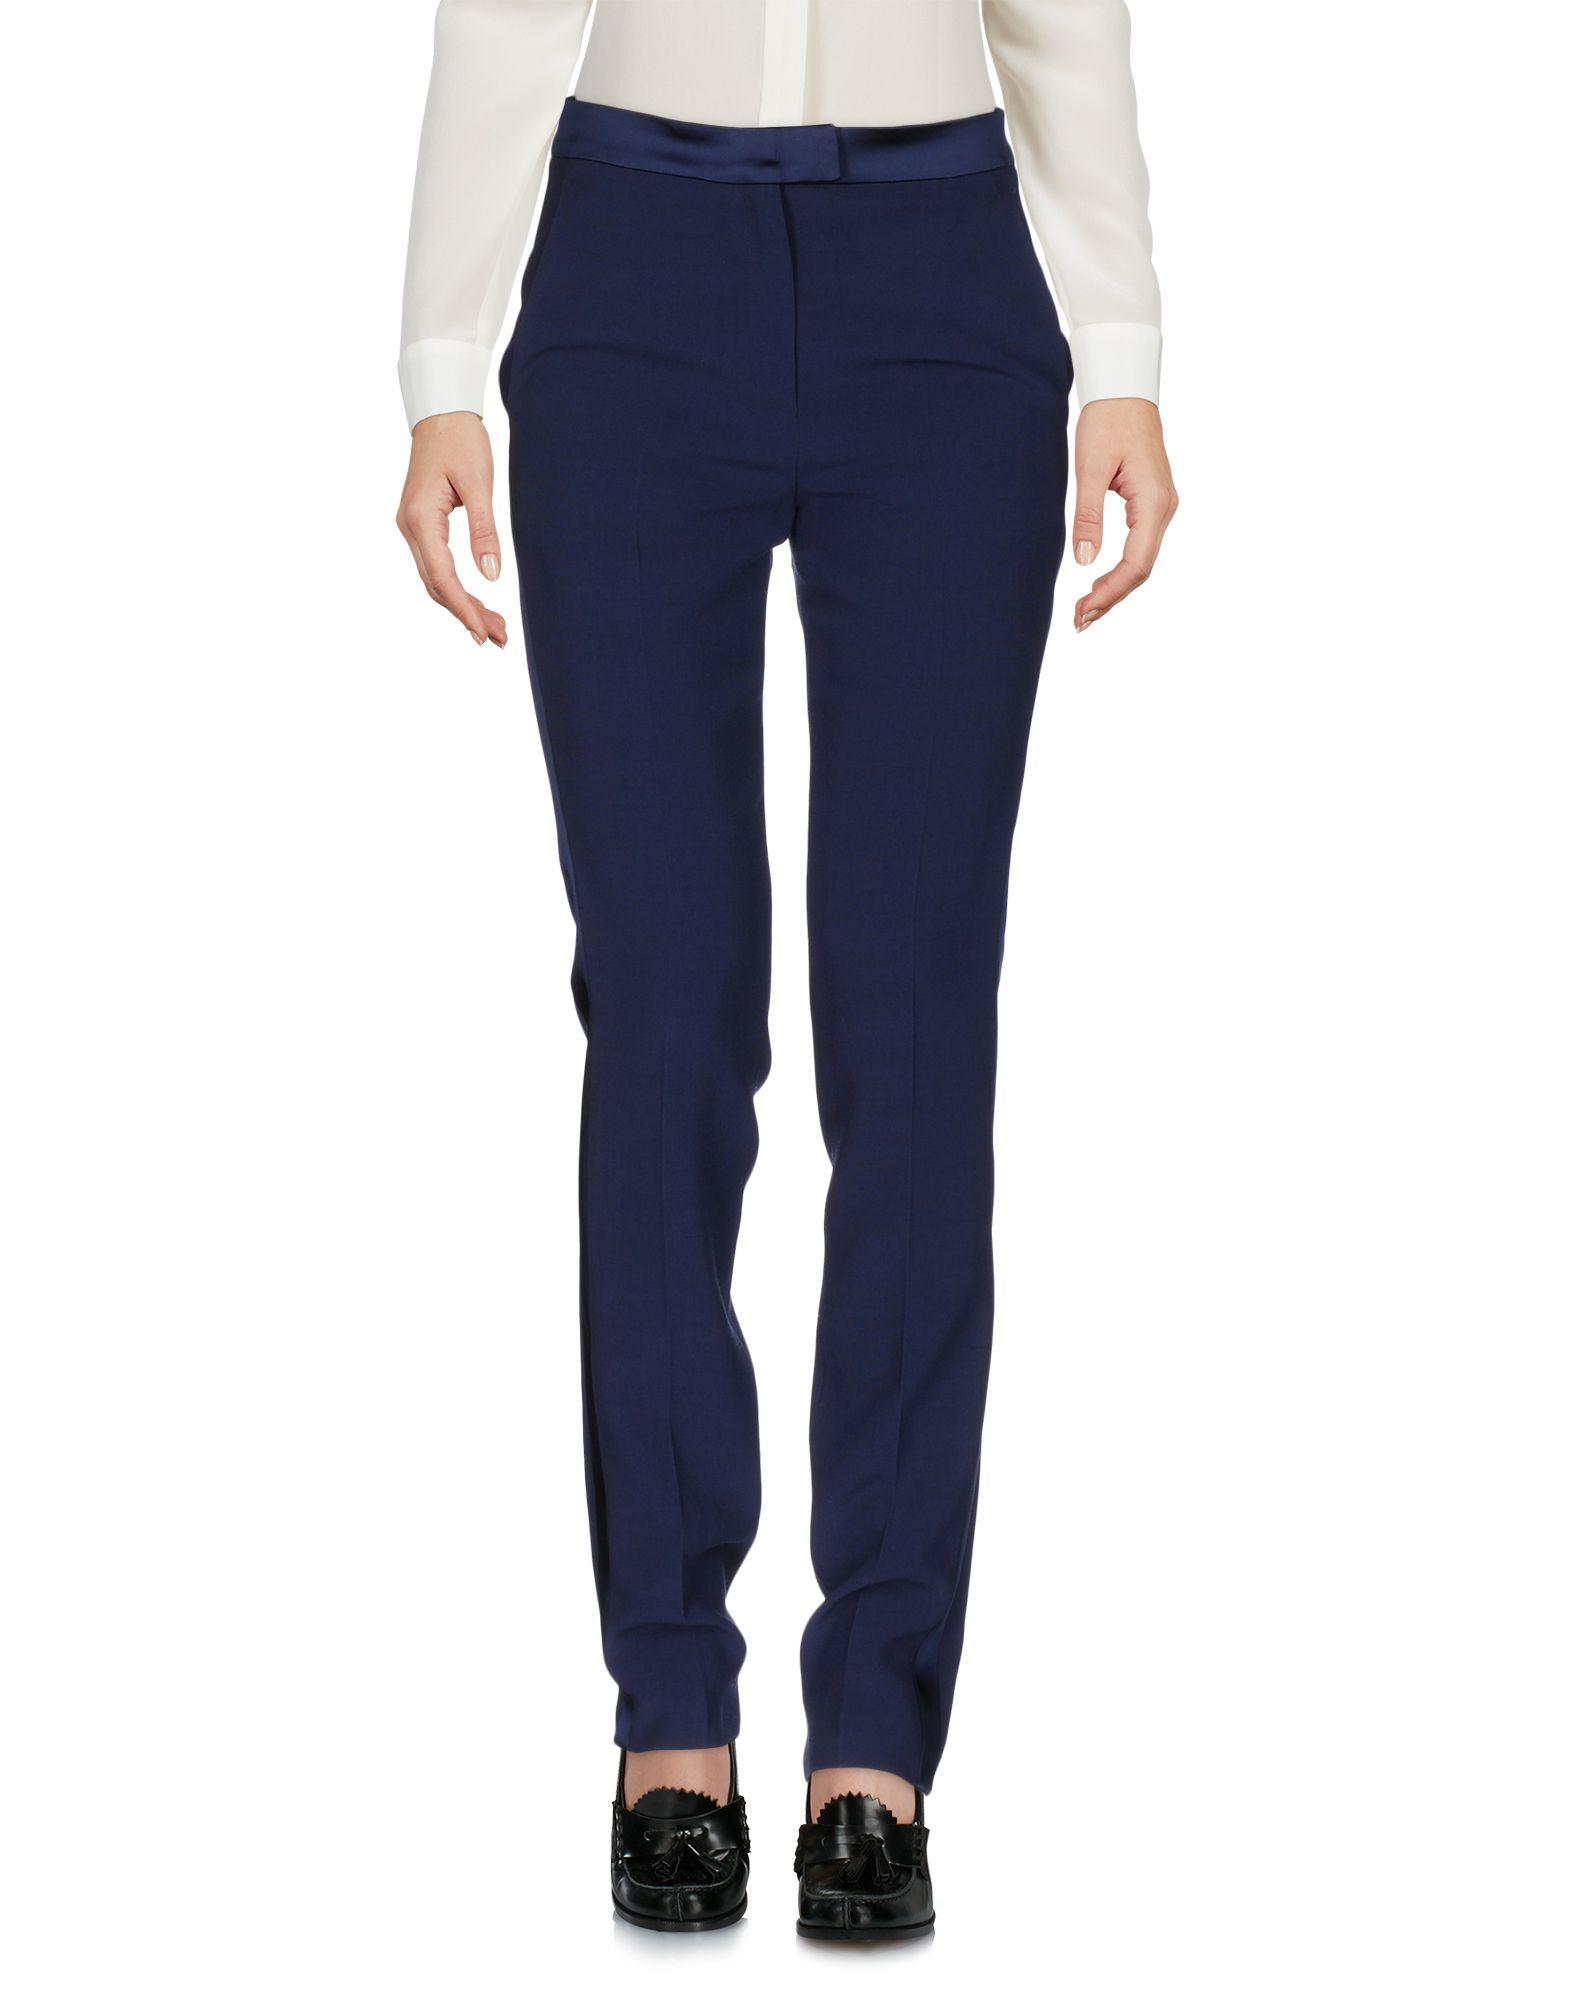 CARLO PIGNATELLI Casual Pants in Blue